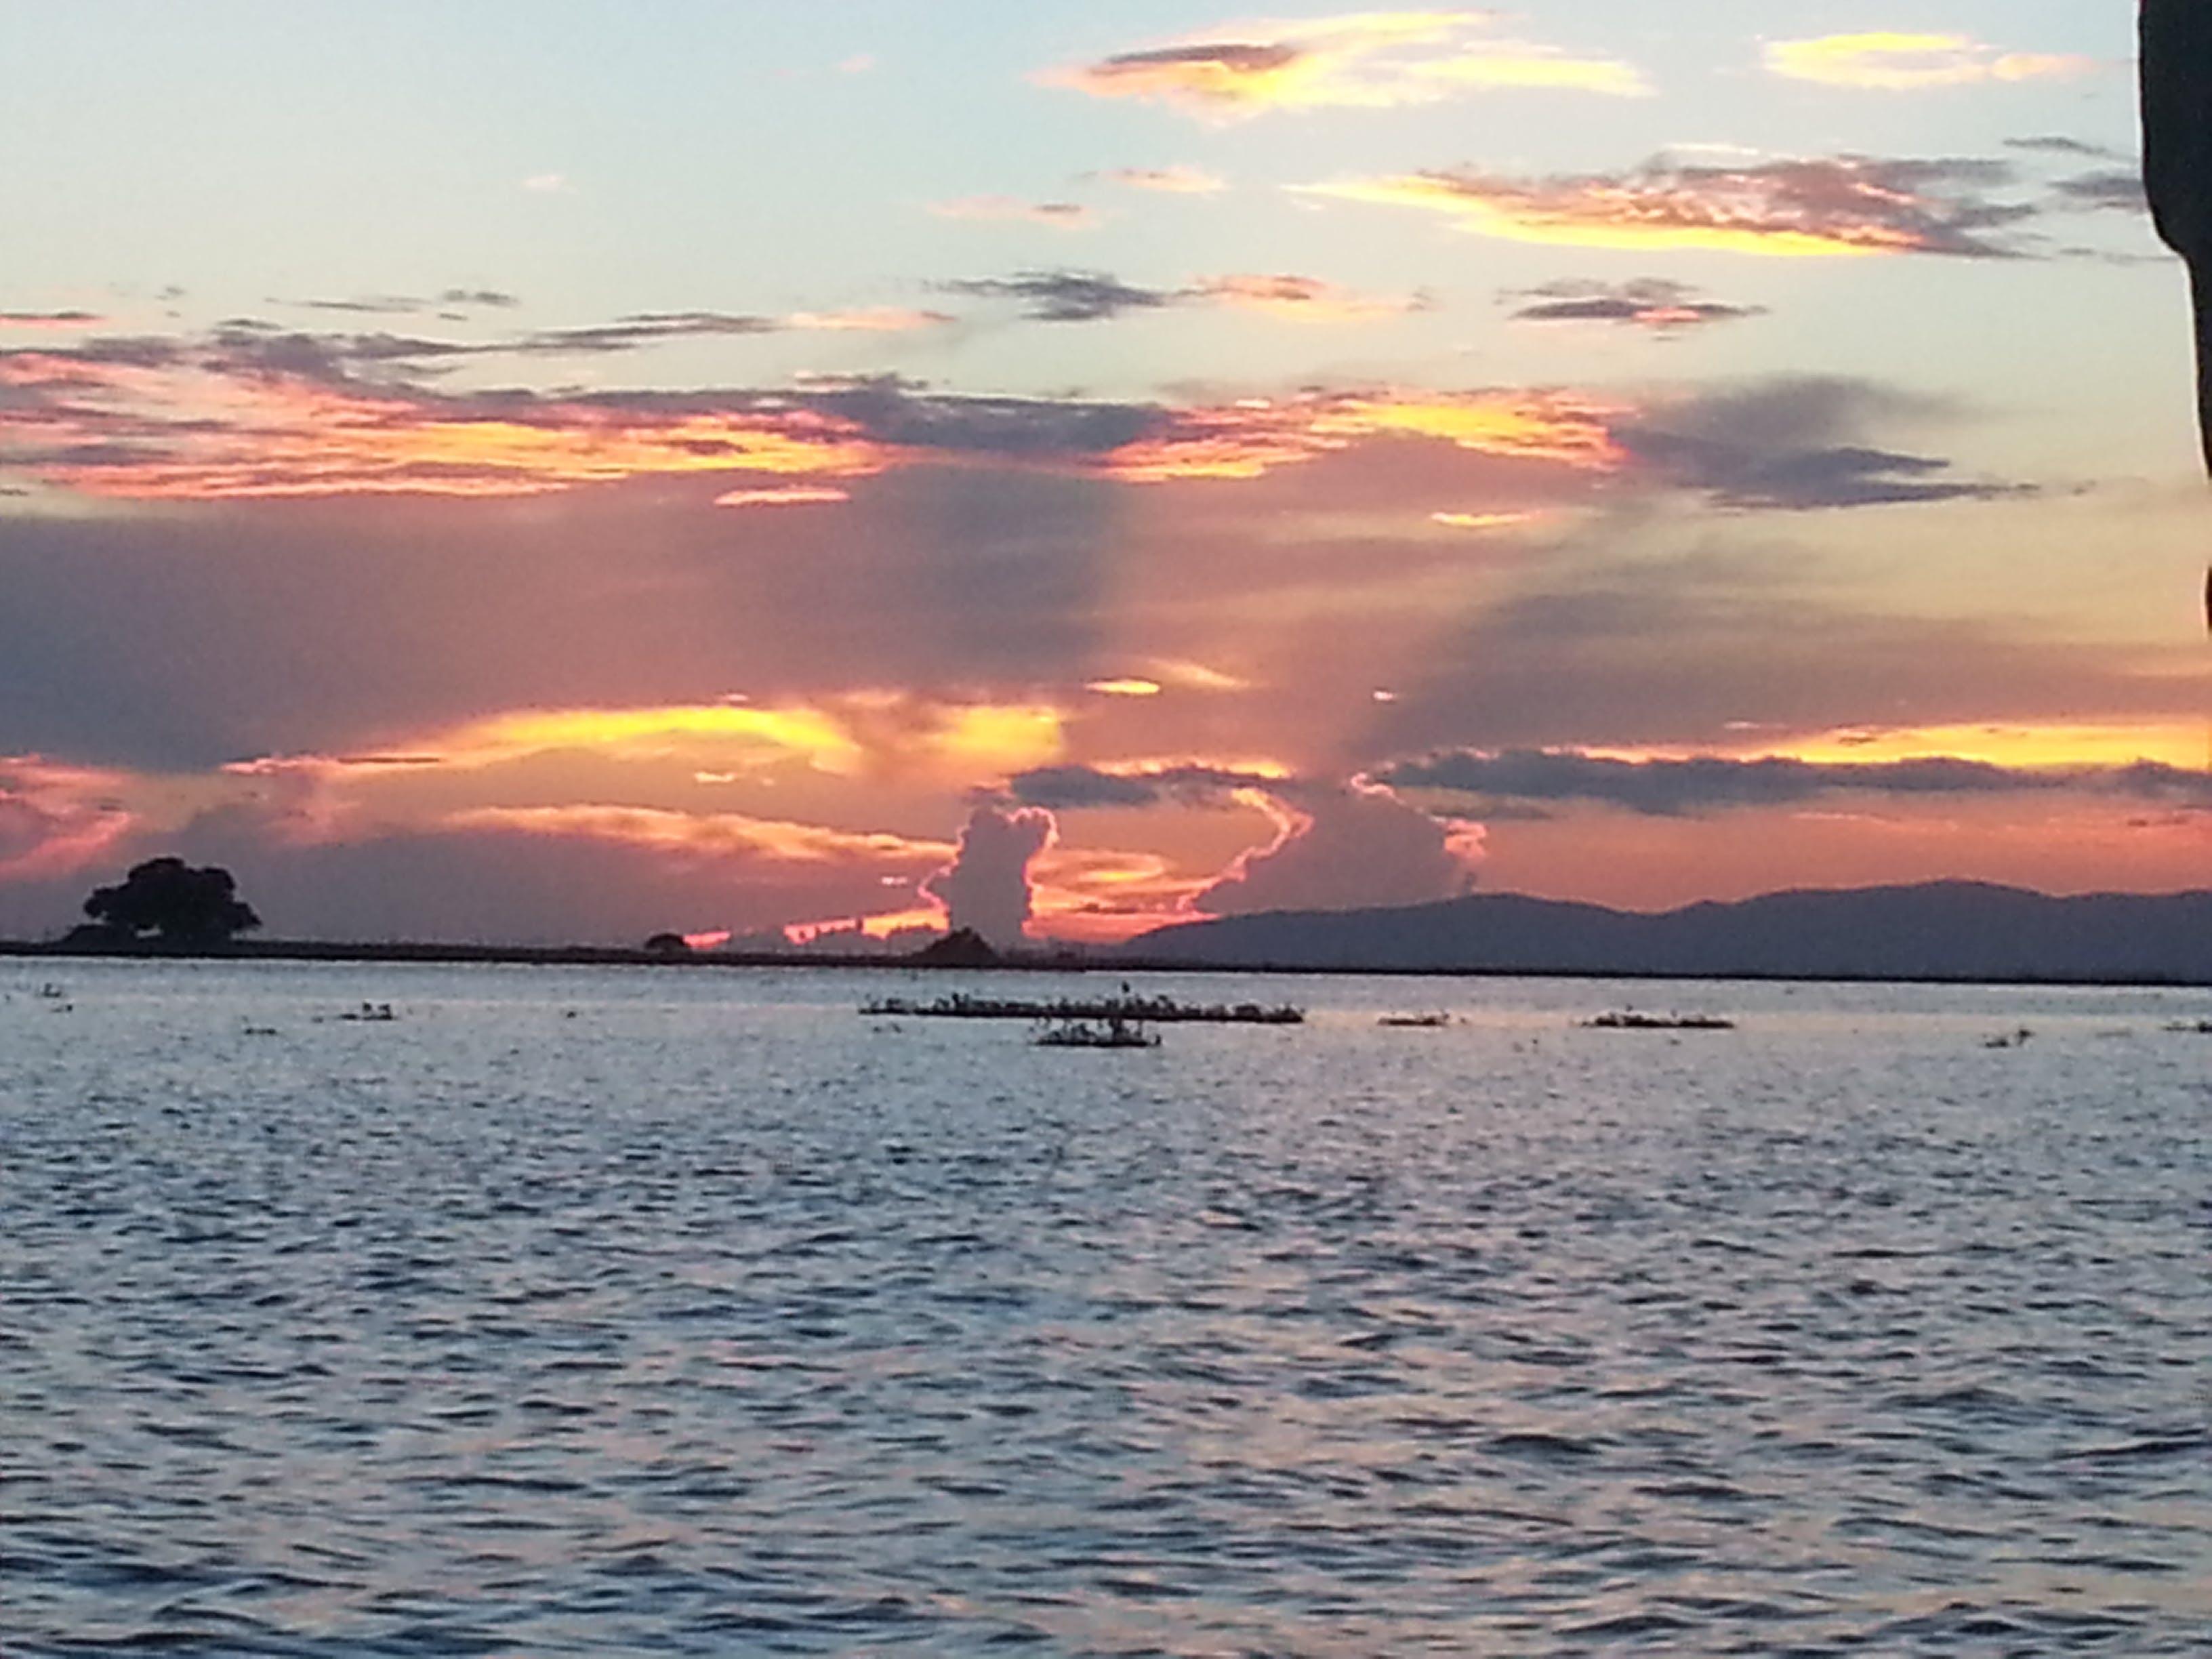 Free stock photo of Sunset at Chilika Lake